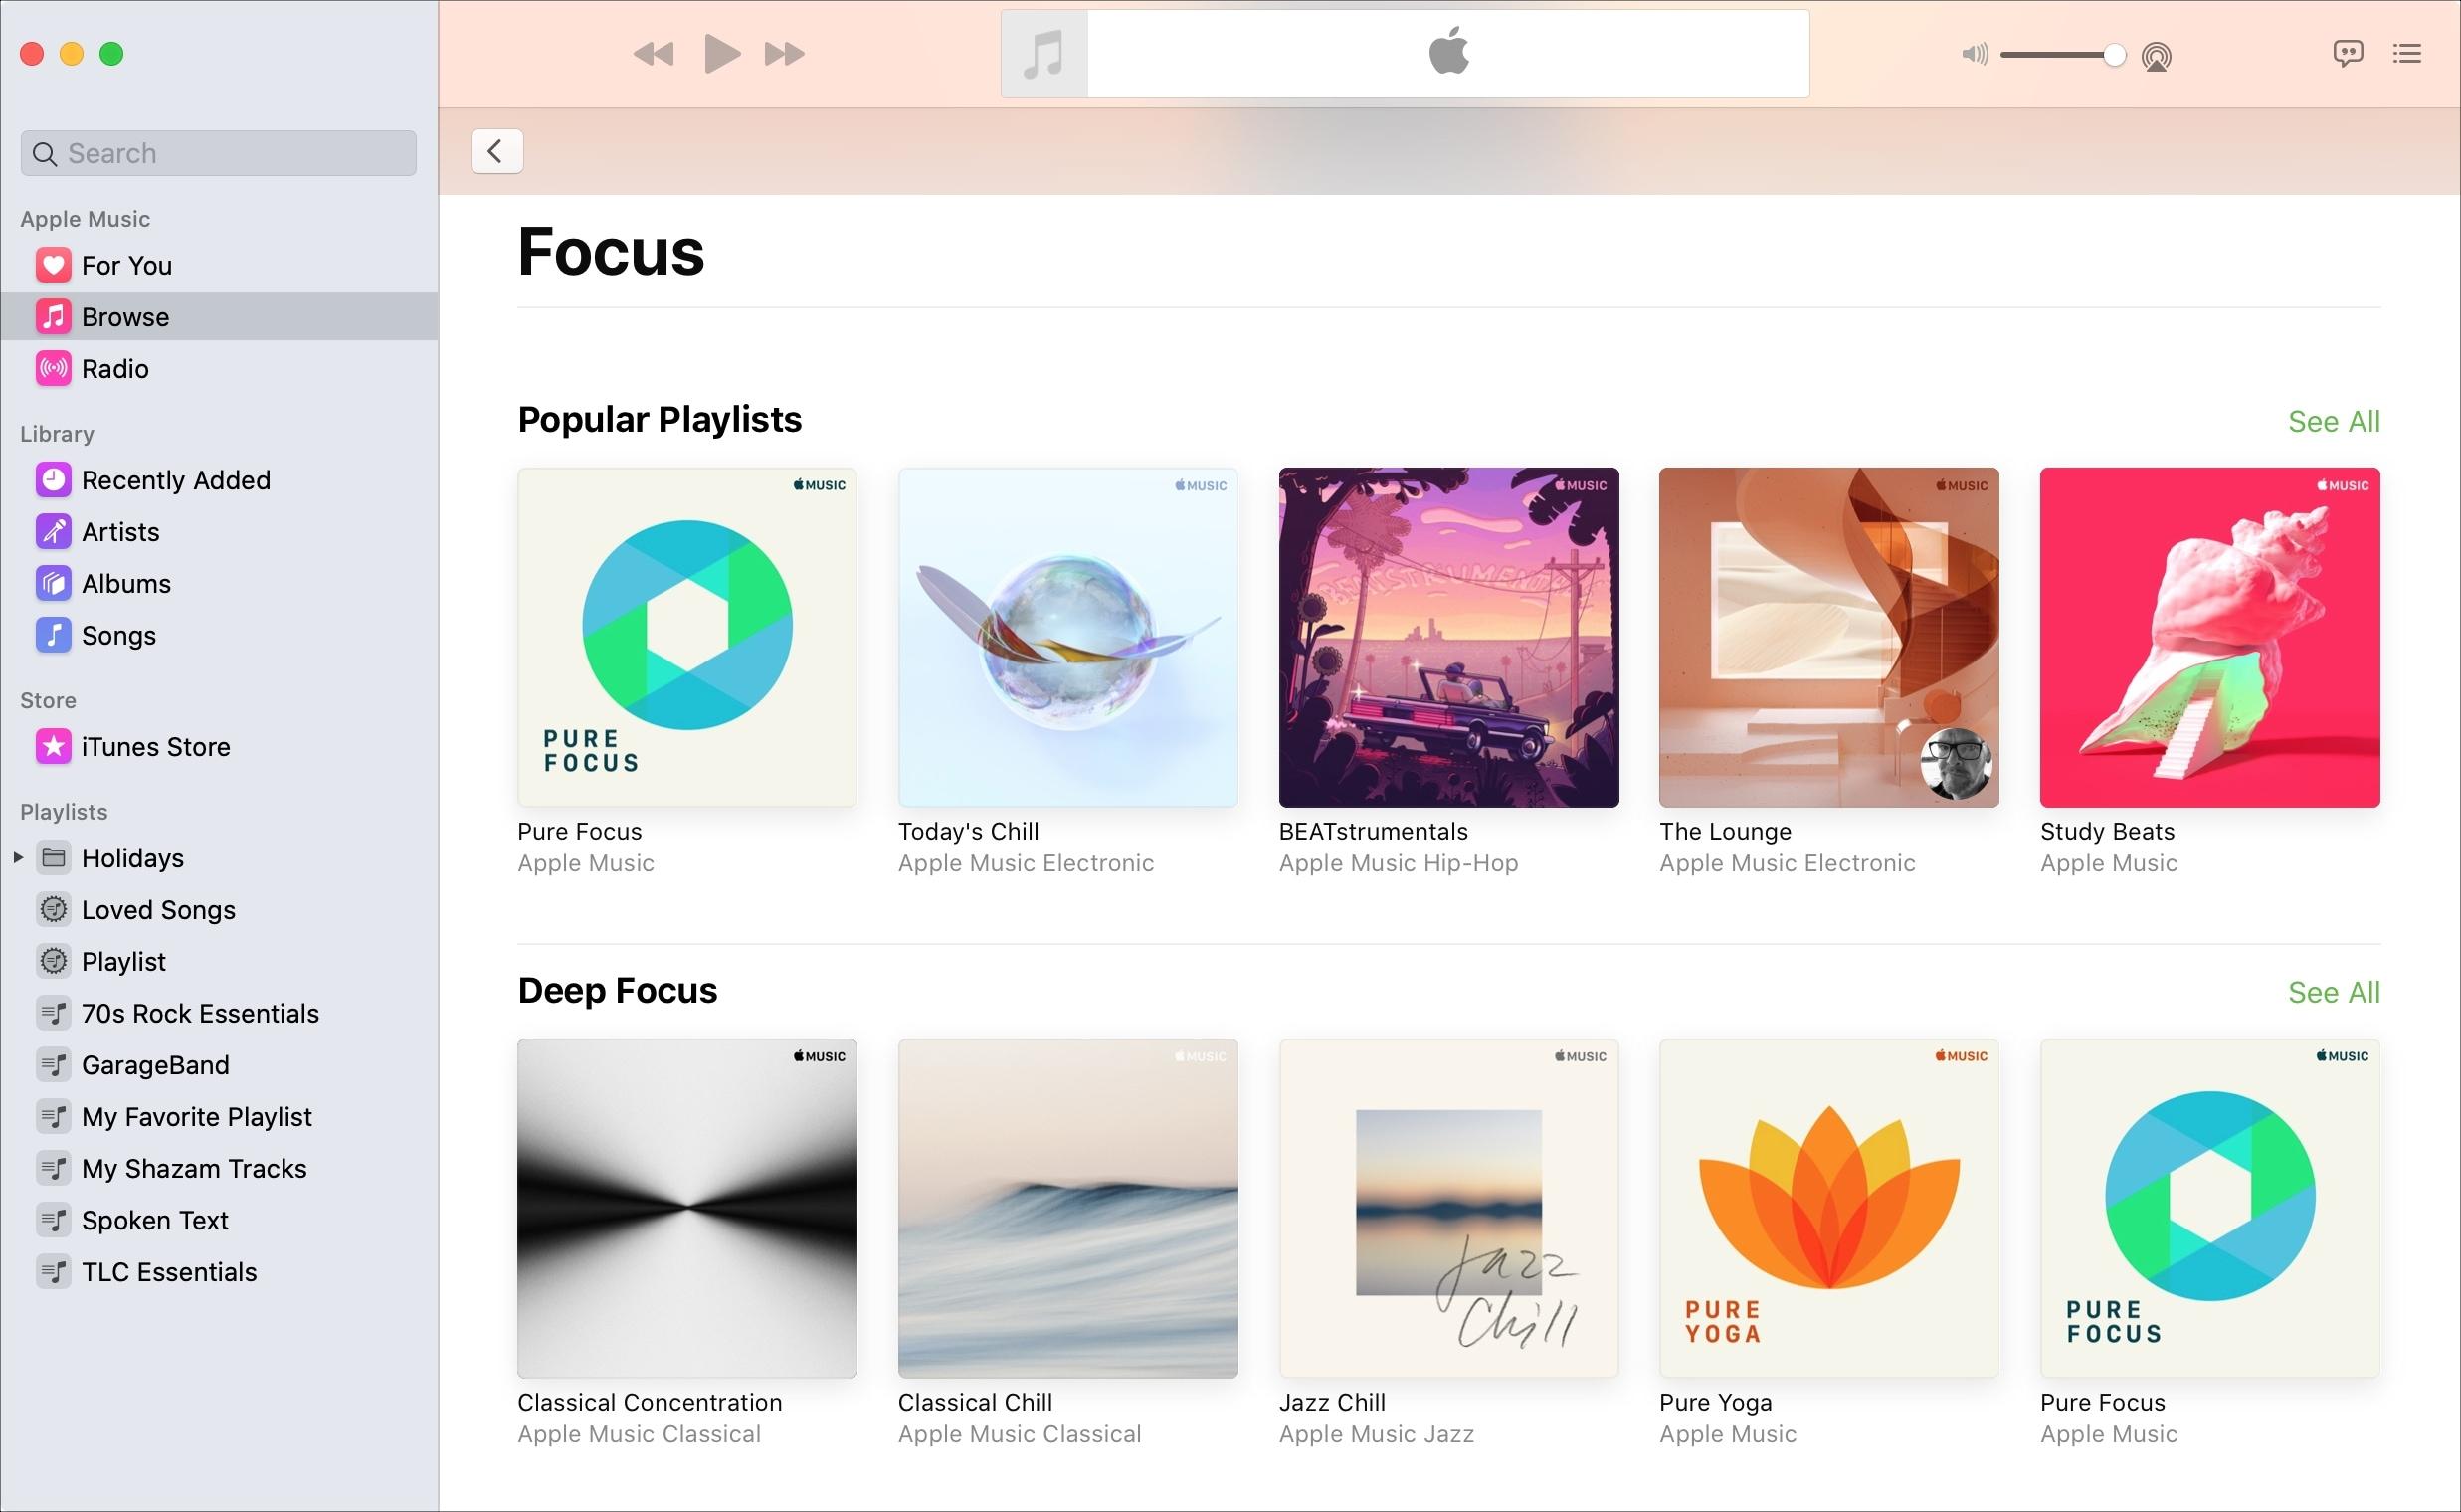 Apple Music Focus sección Mac